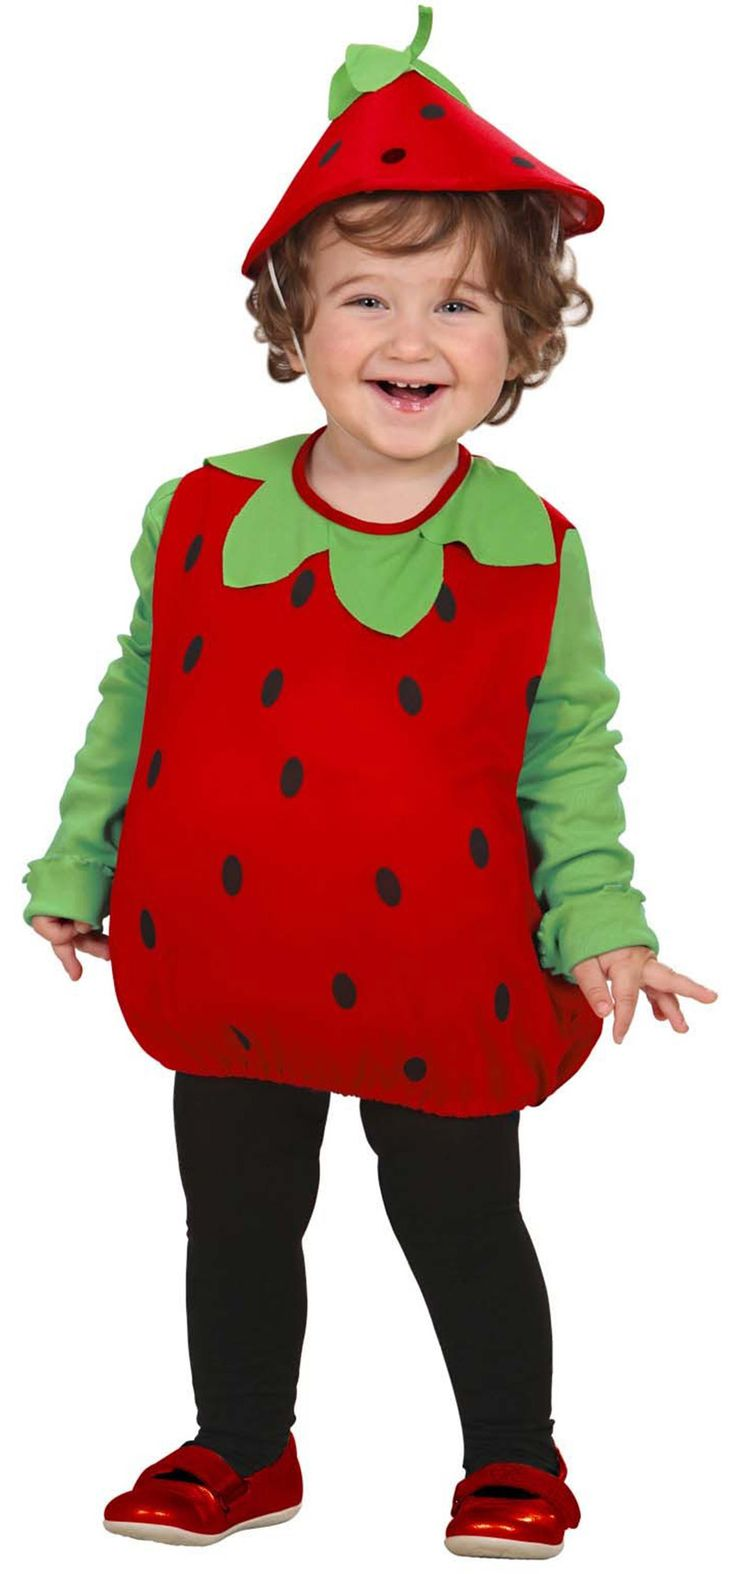 17 meilleures id es propos de pineapple costume sur pinterest f tes coll ge d 39 halloween - Idee de deguisement groupe ...